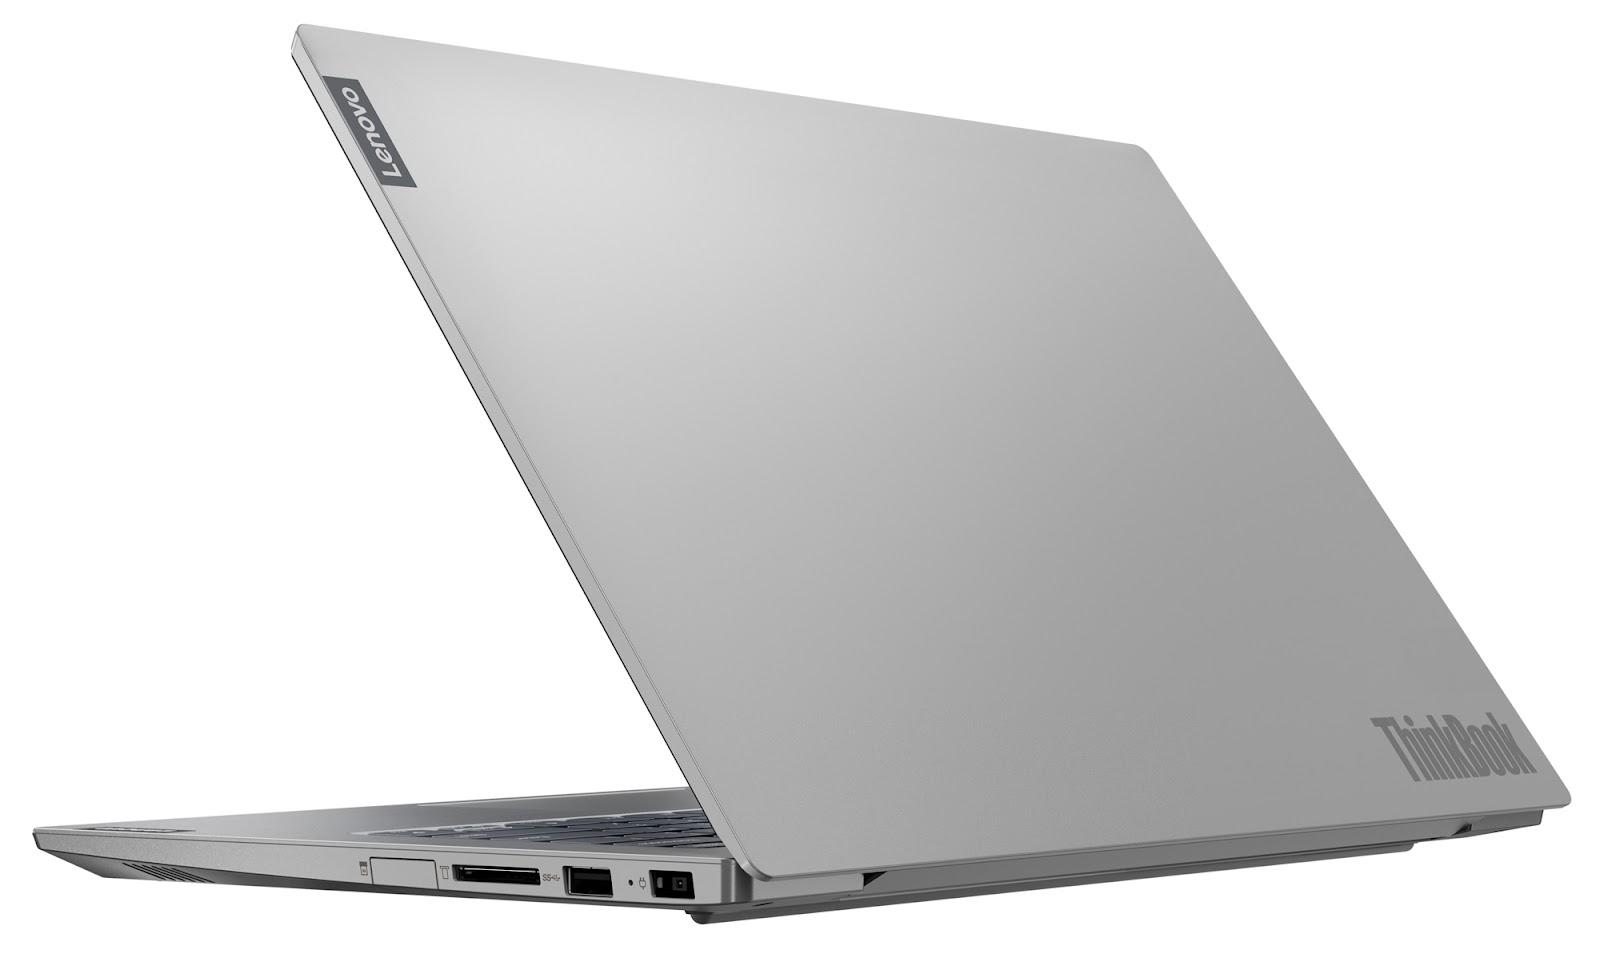 Фото 2. Ноутбук Lenovo ThinkBook 14 IIL (20SL00F1RU)